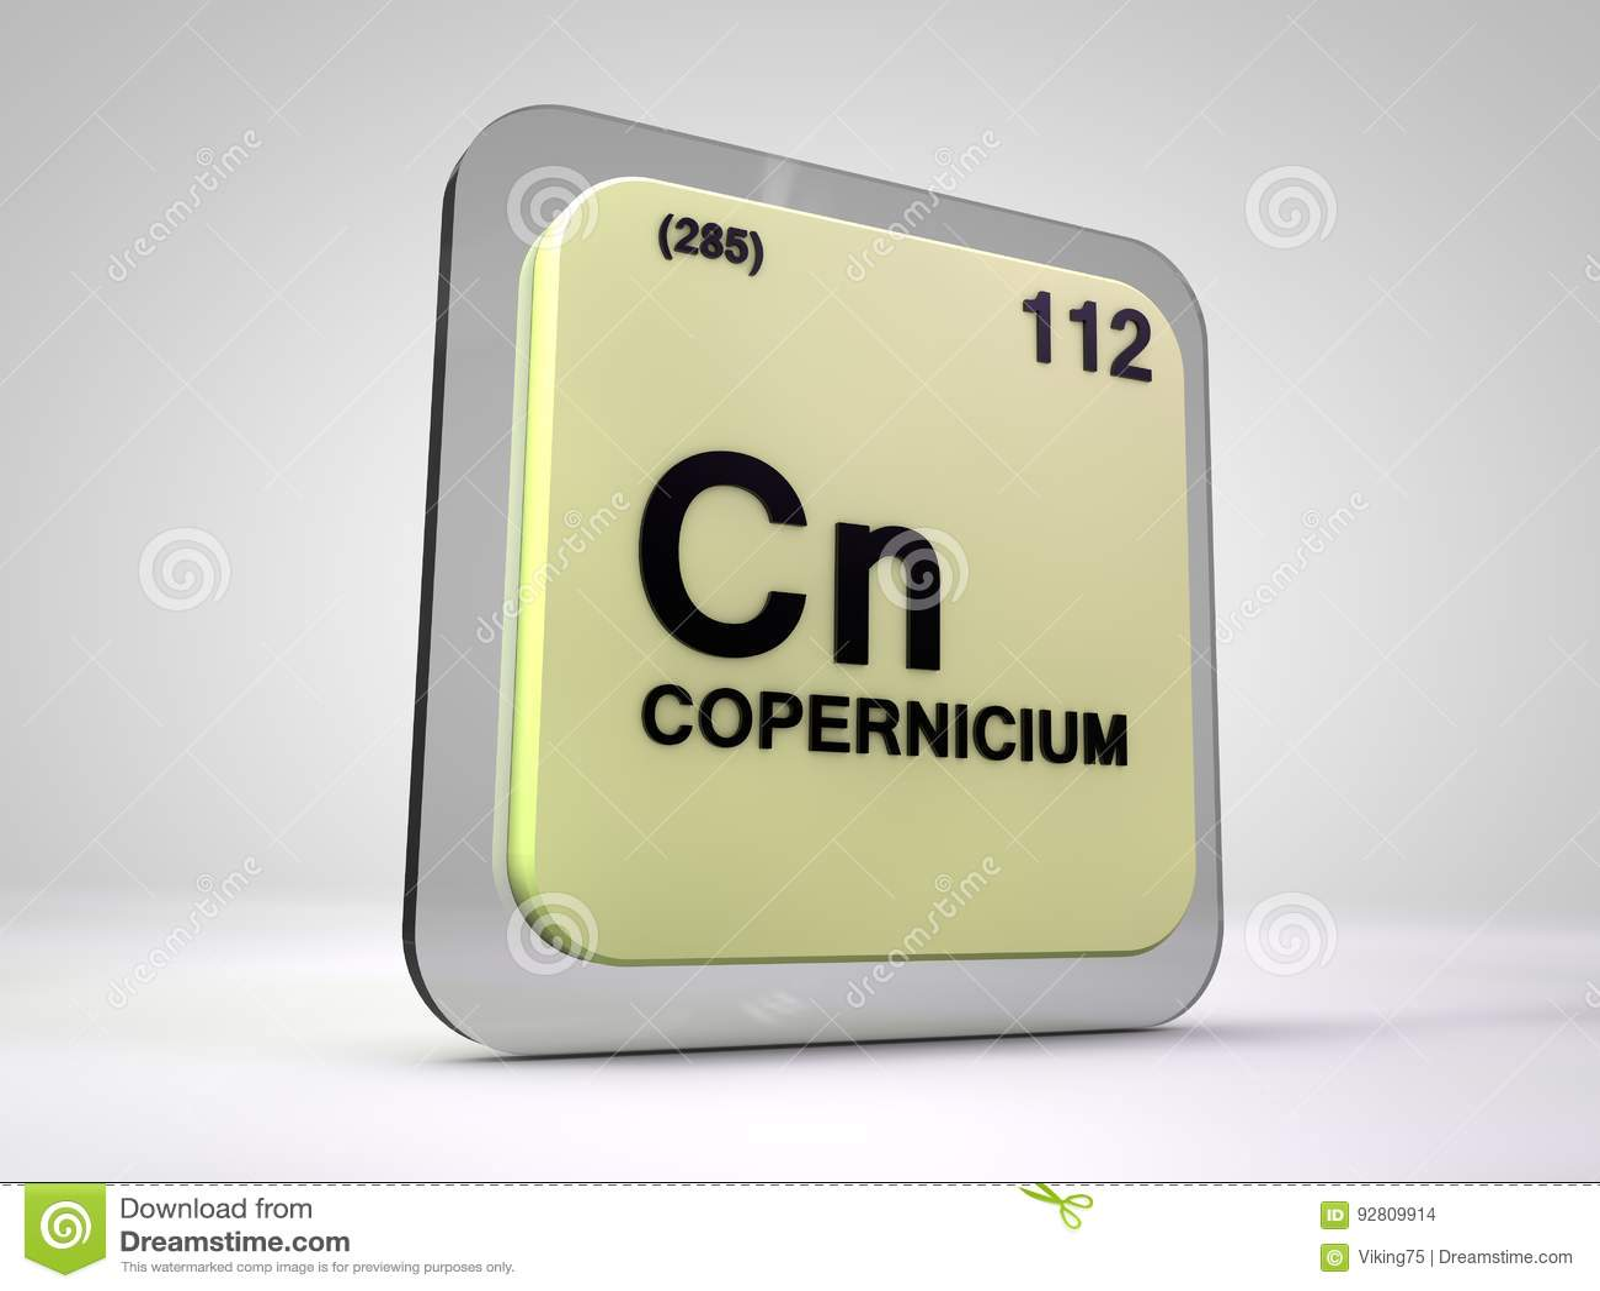 Copernicium cn chemical element periodic table stock copernicium cn chemical element periodic table gamestrikefo Choice Image